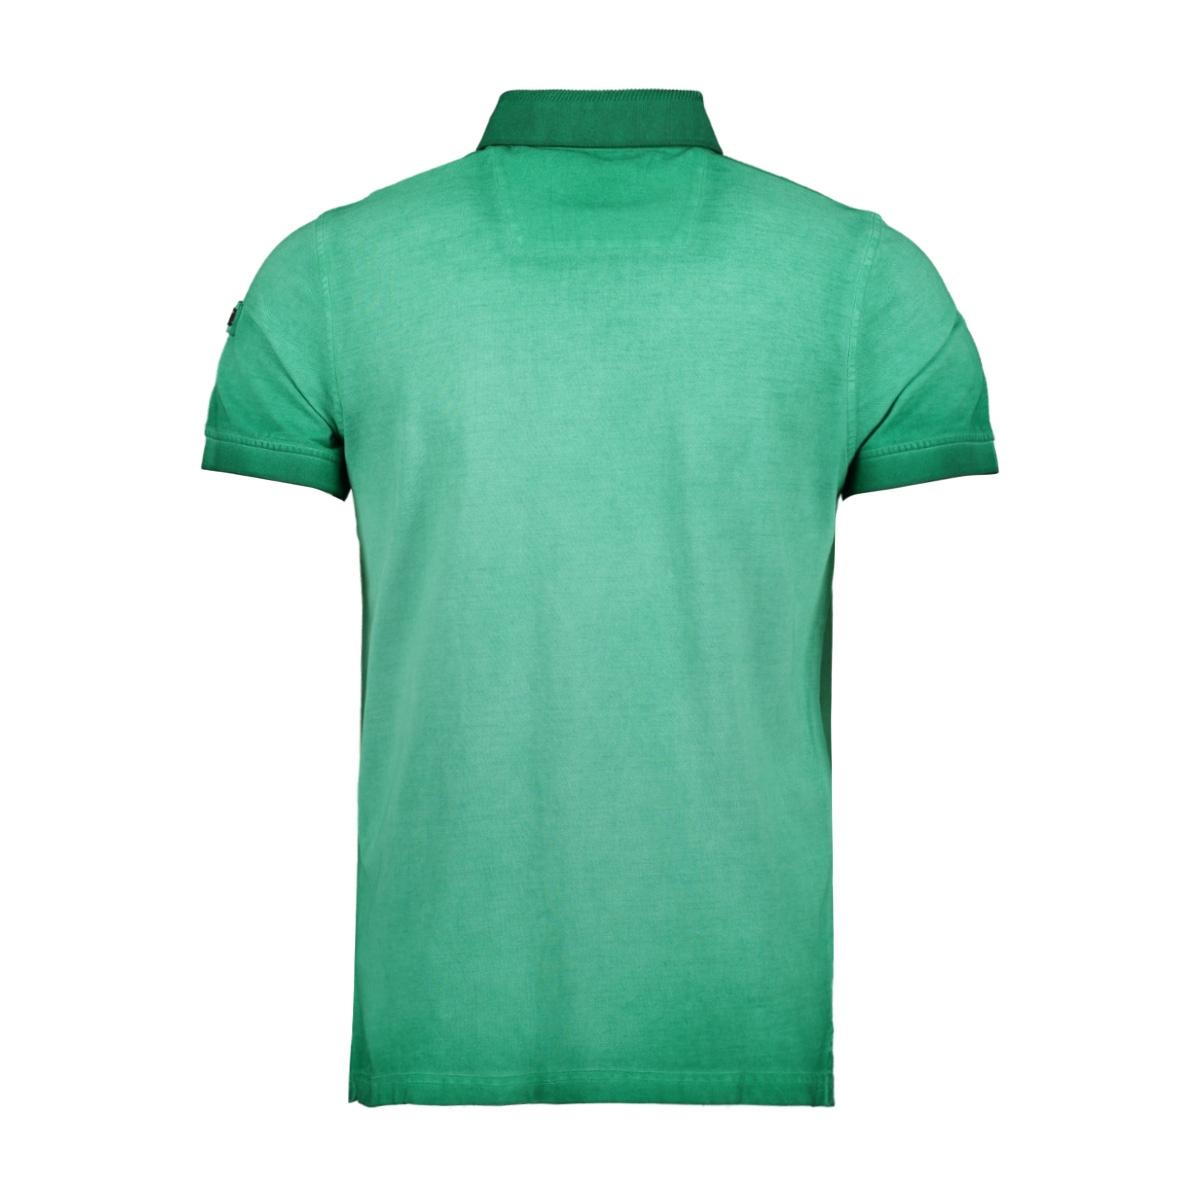 light pique short sleeve polo ppss202864 pme legend polo 6253